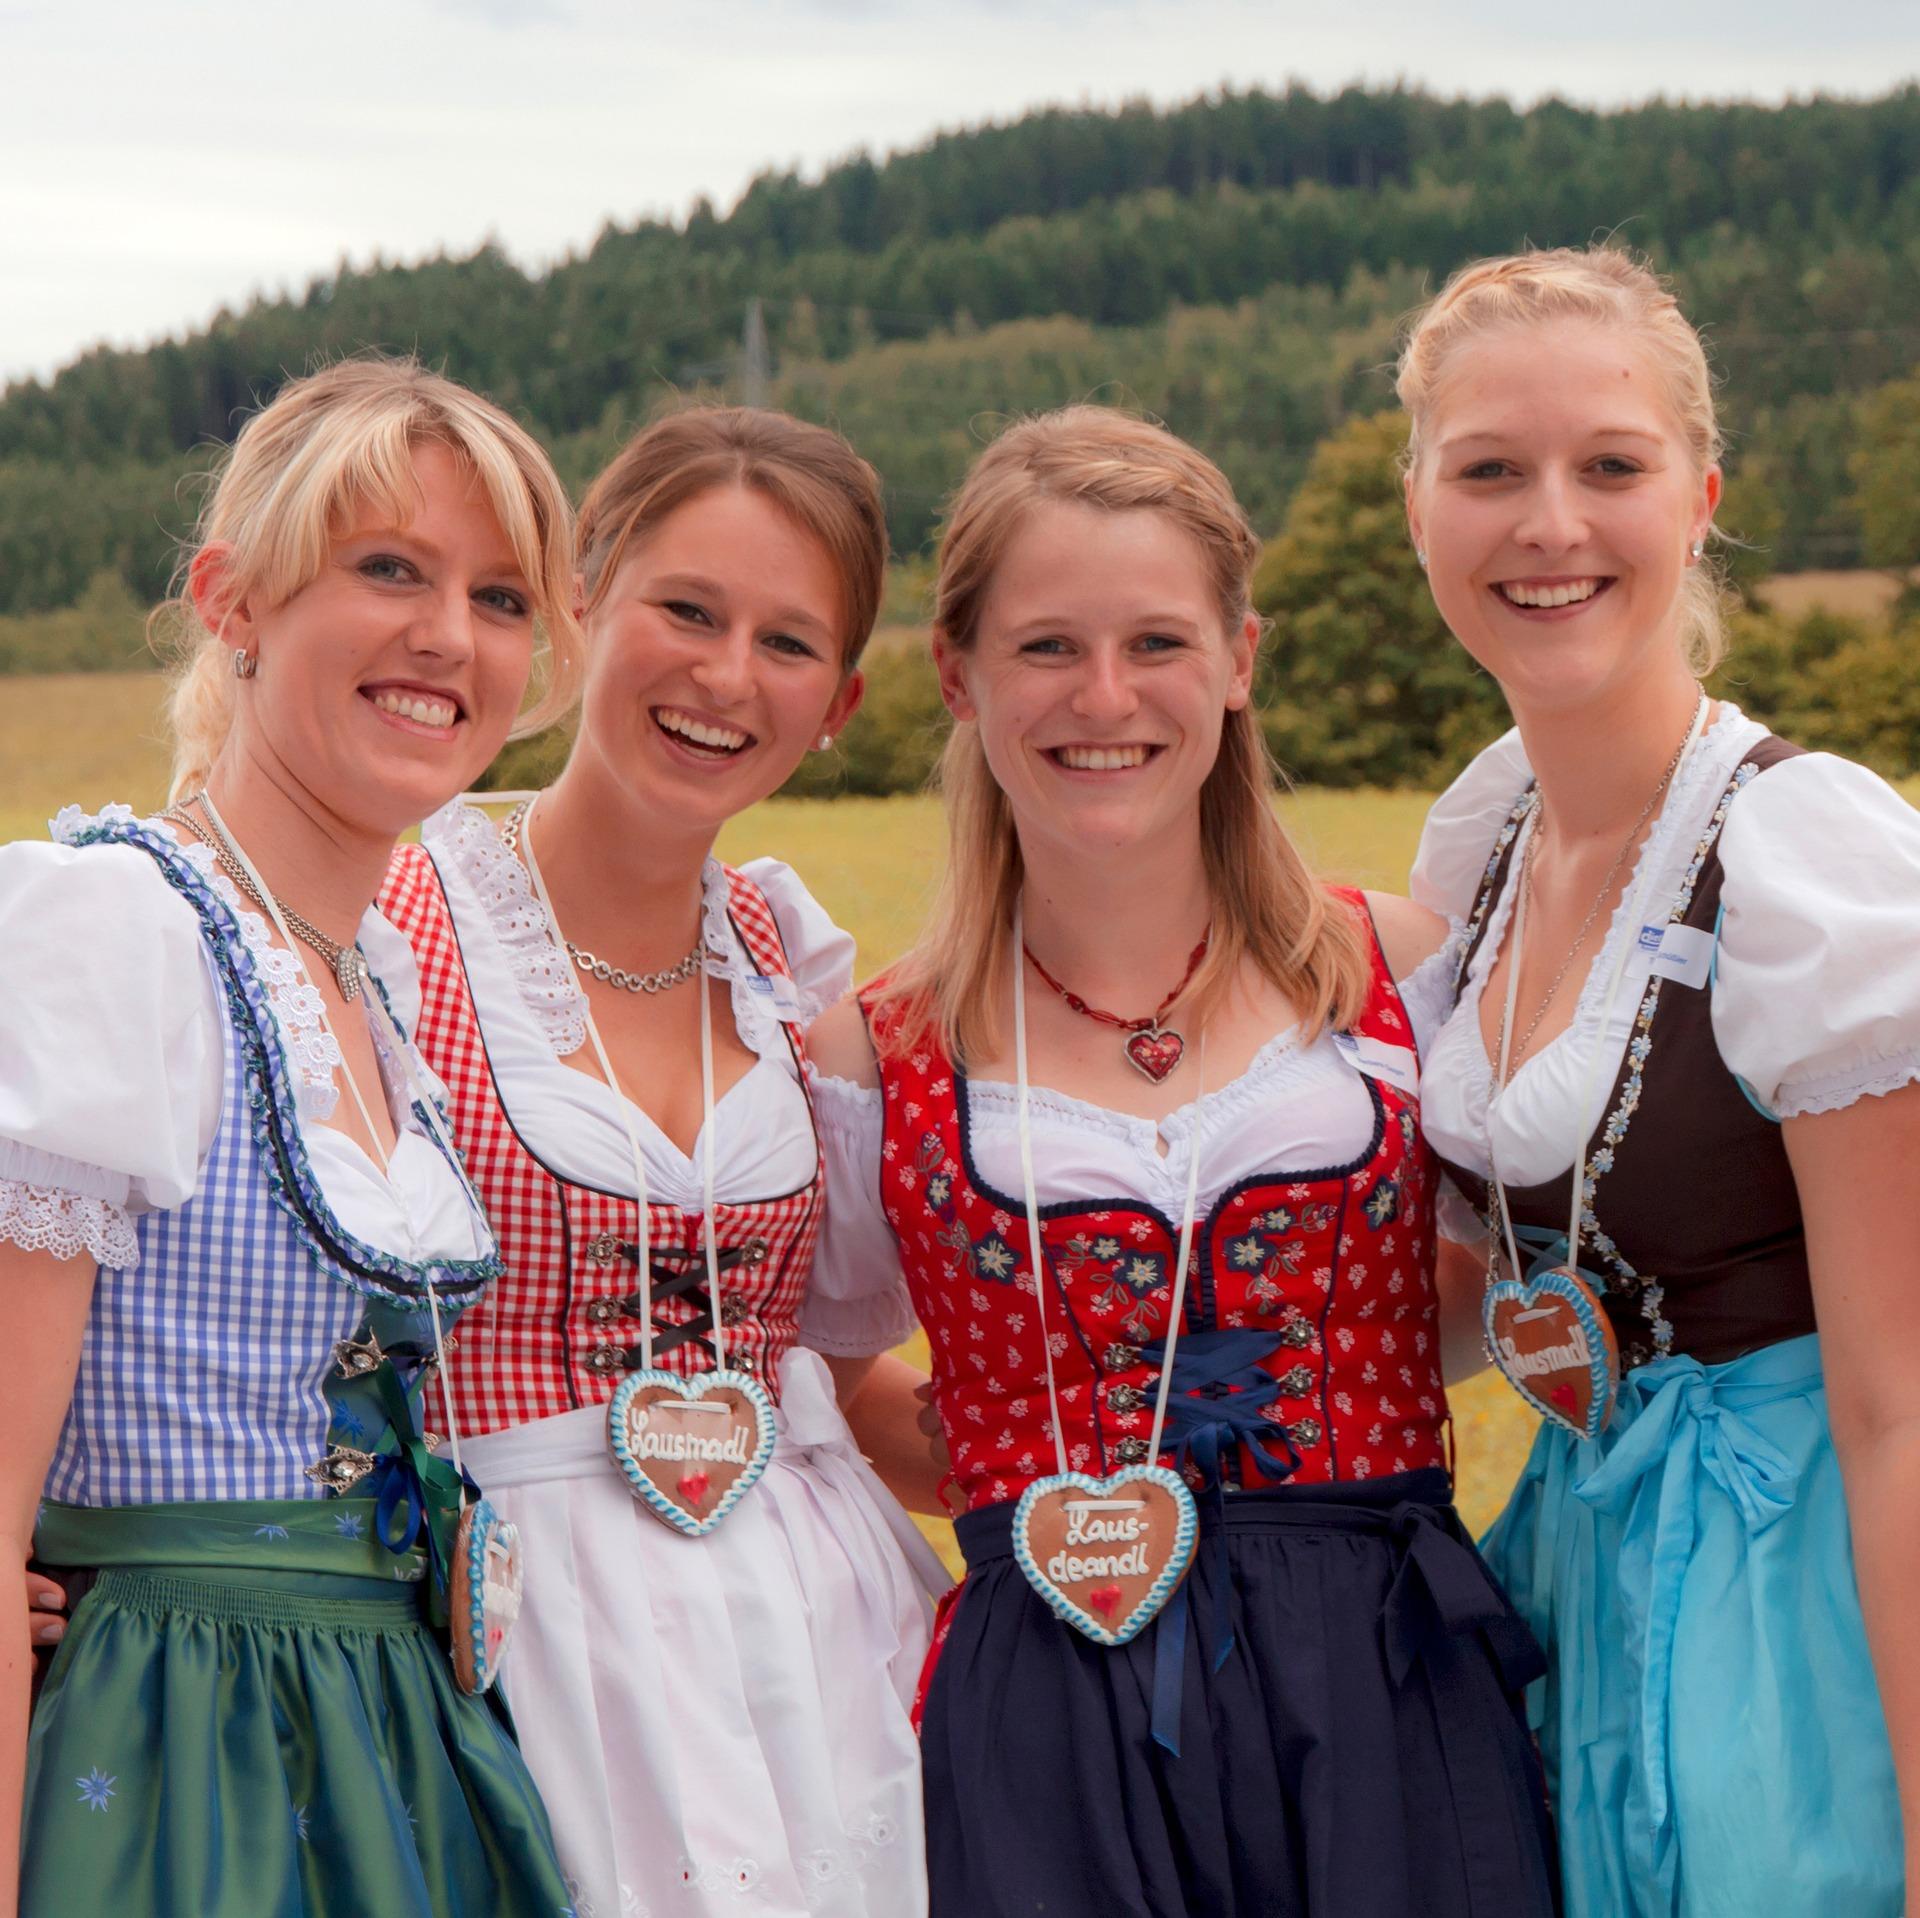 Echte Förderung unserer Dialekte statt Alibi-Politik (Landtagswahl 2018)